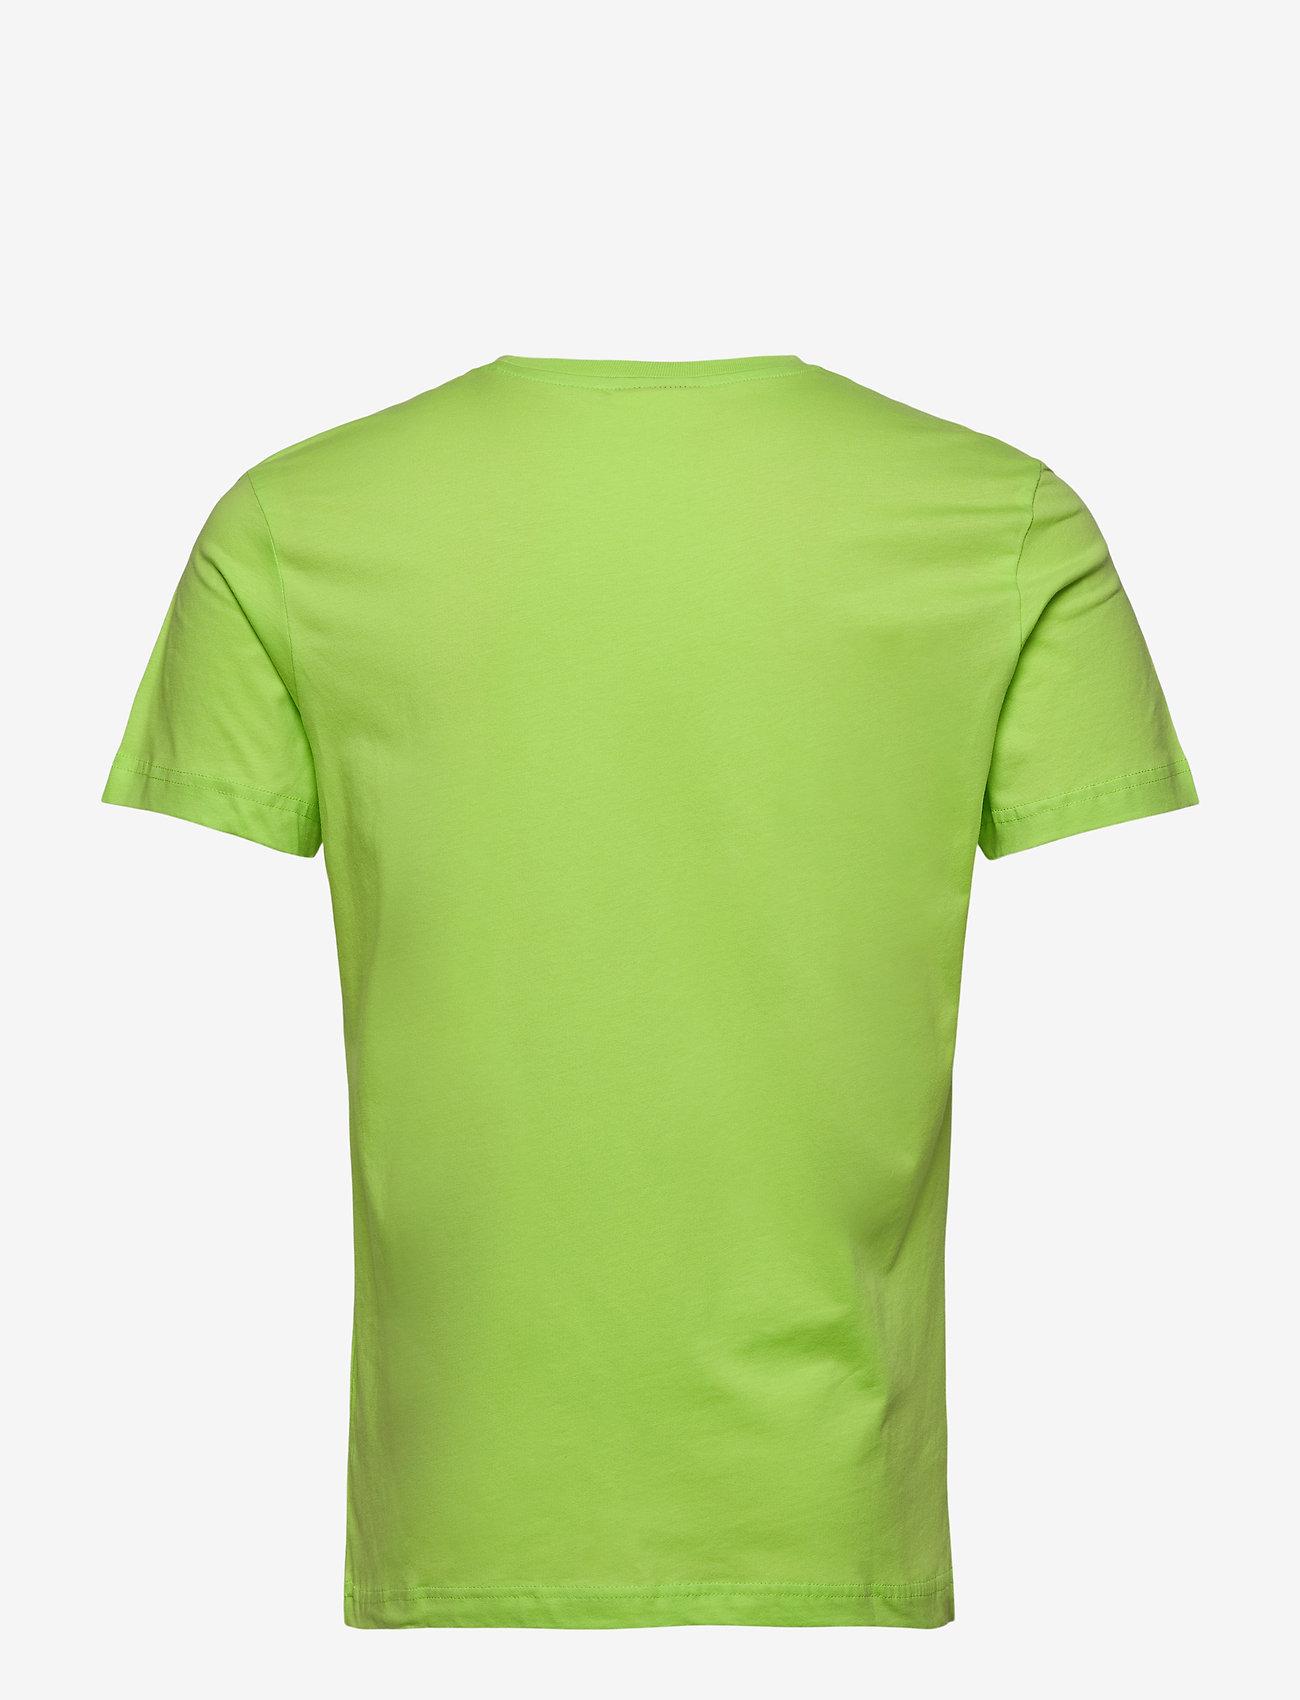 Diesel Men - T-DIEGOS-K30 T-SHIRT - basic t-shirts - lime green fluo - 1